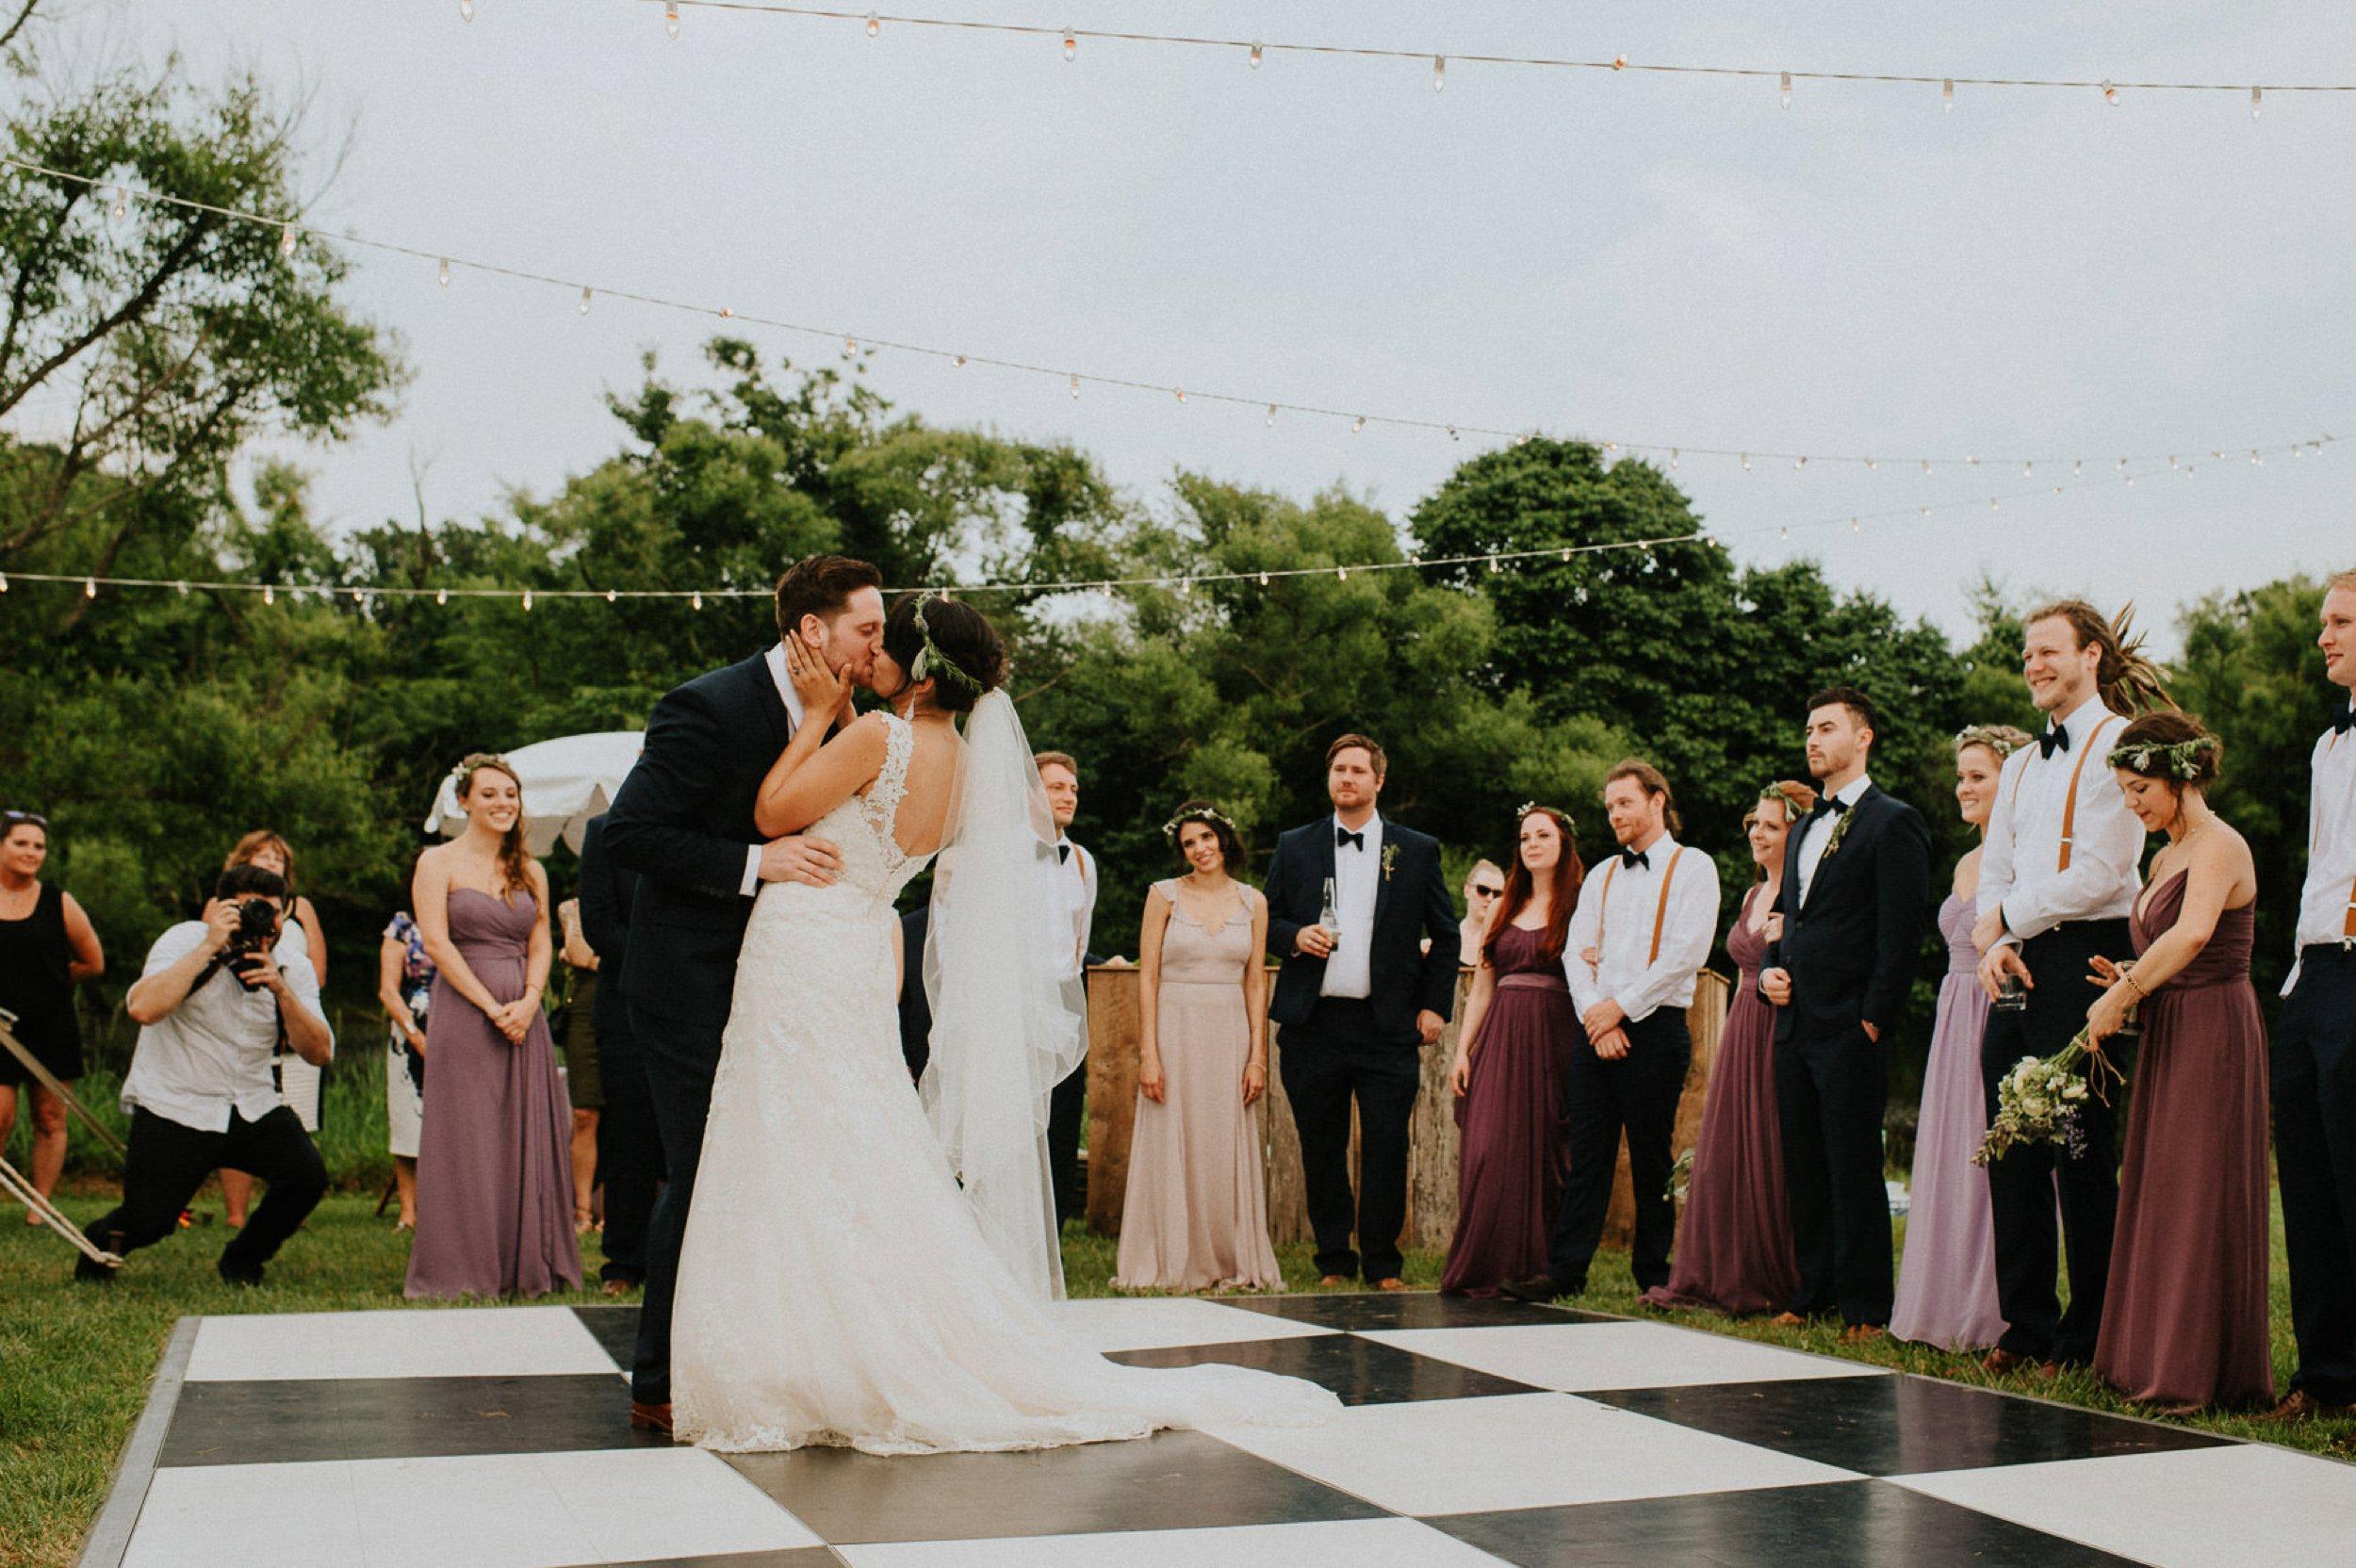 milburn_farms-wedding-96.jpg